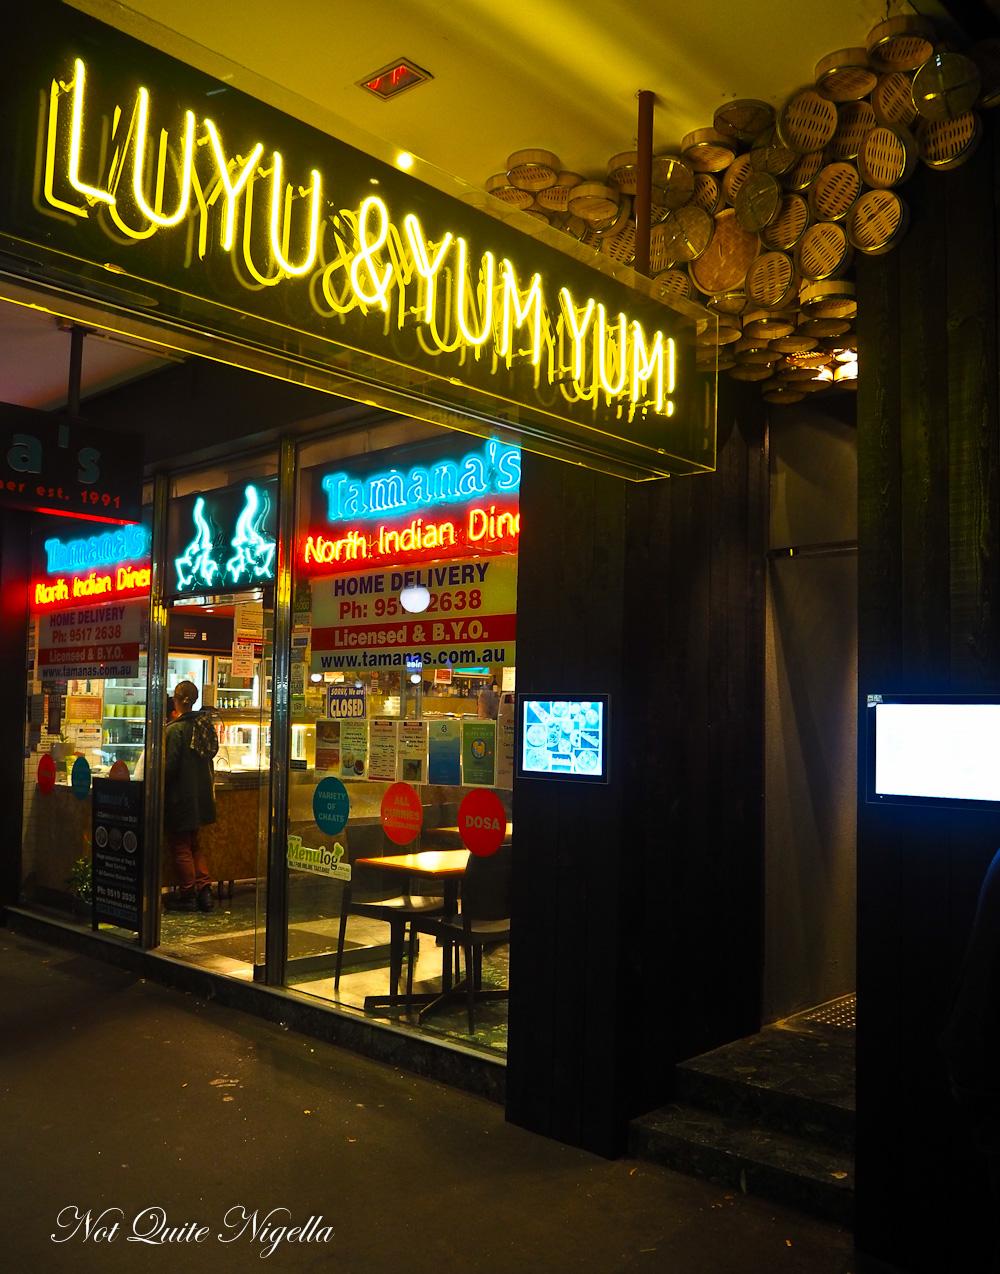 Luyu Yum Yums